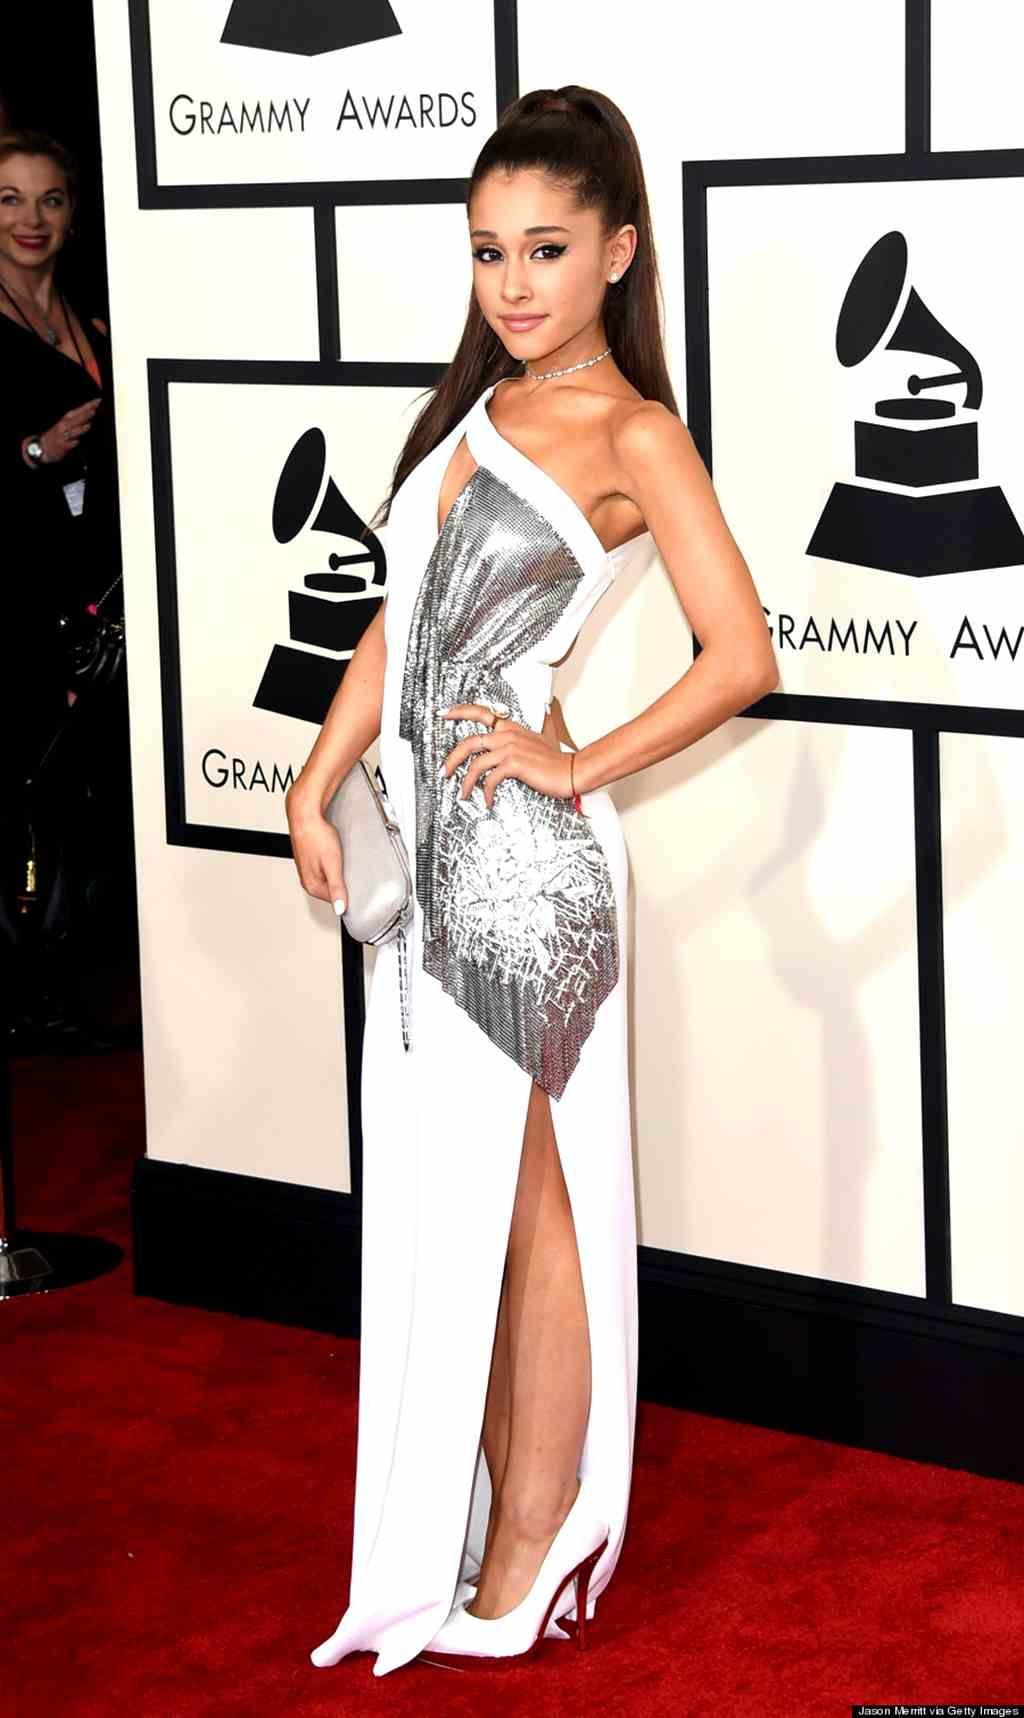 Ariana grande grammy dress 2015 my style pinterest for Ariana grande wedding dress